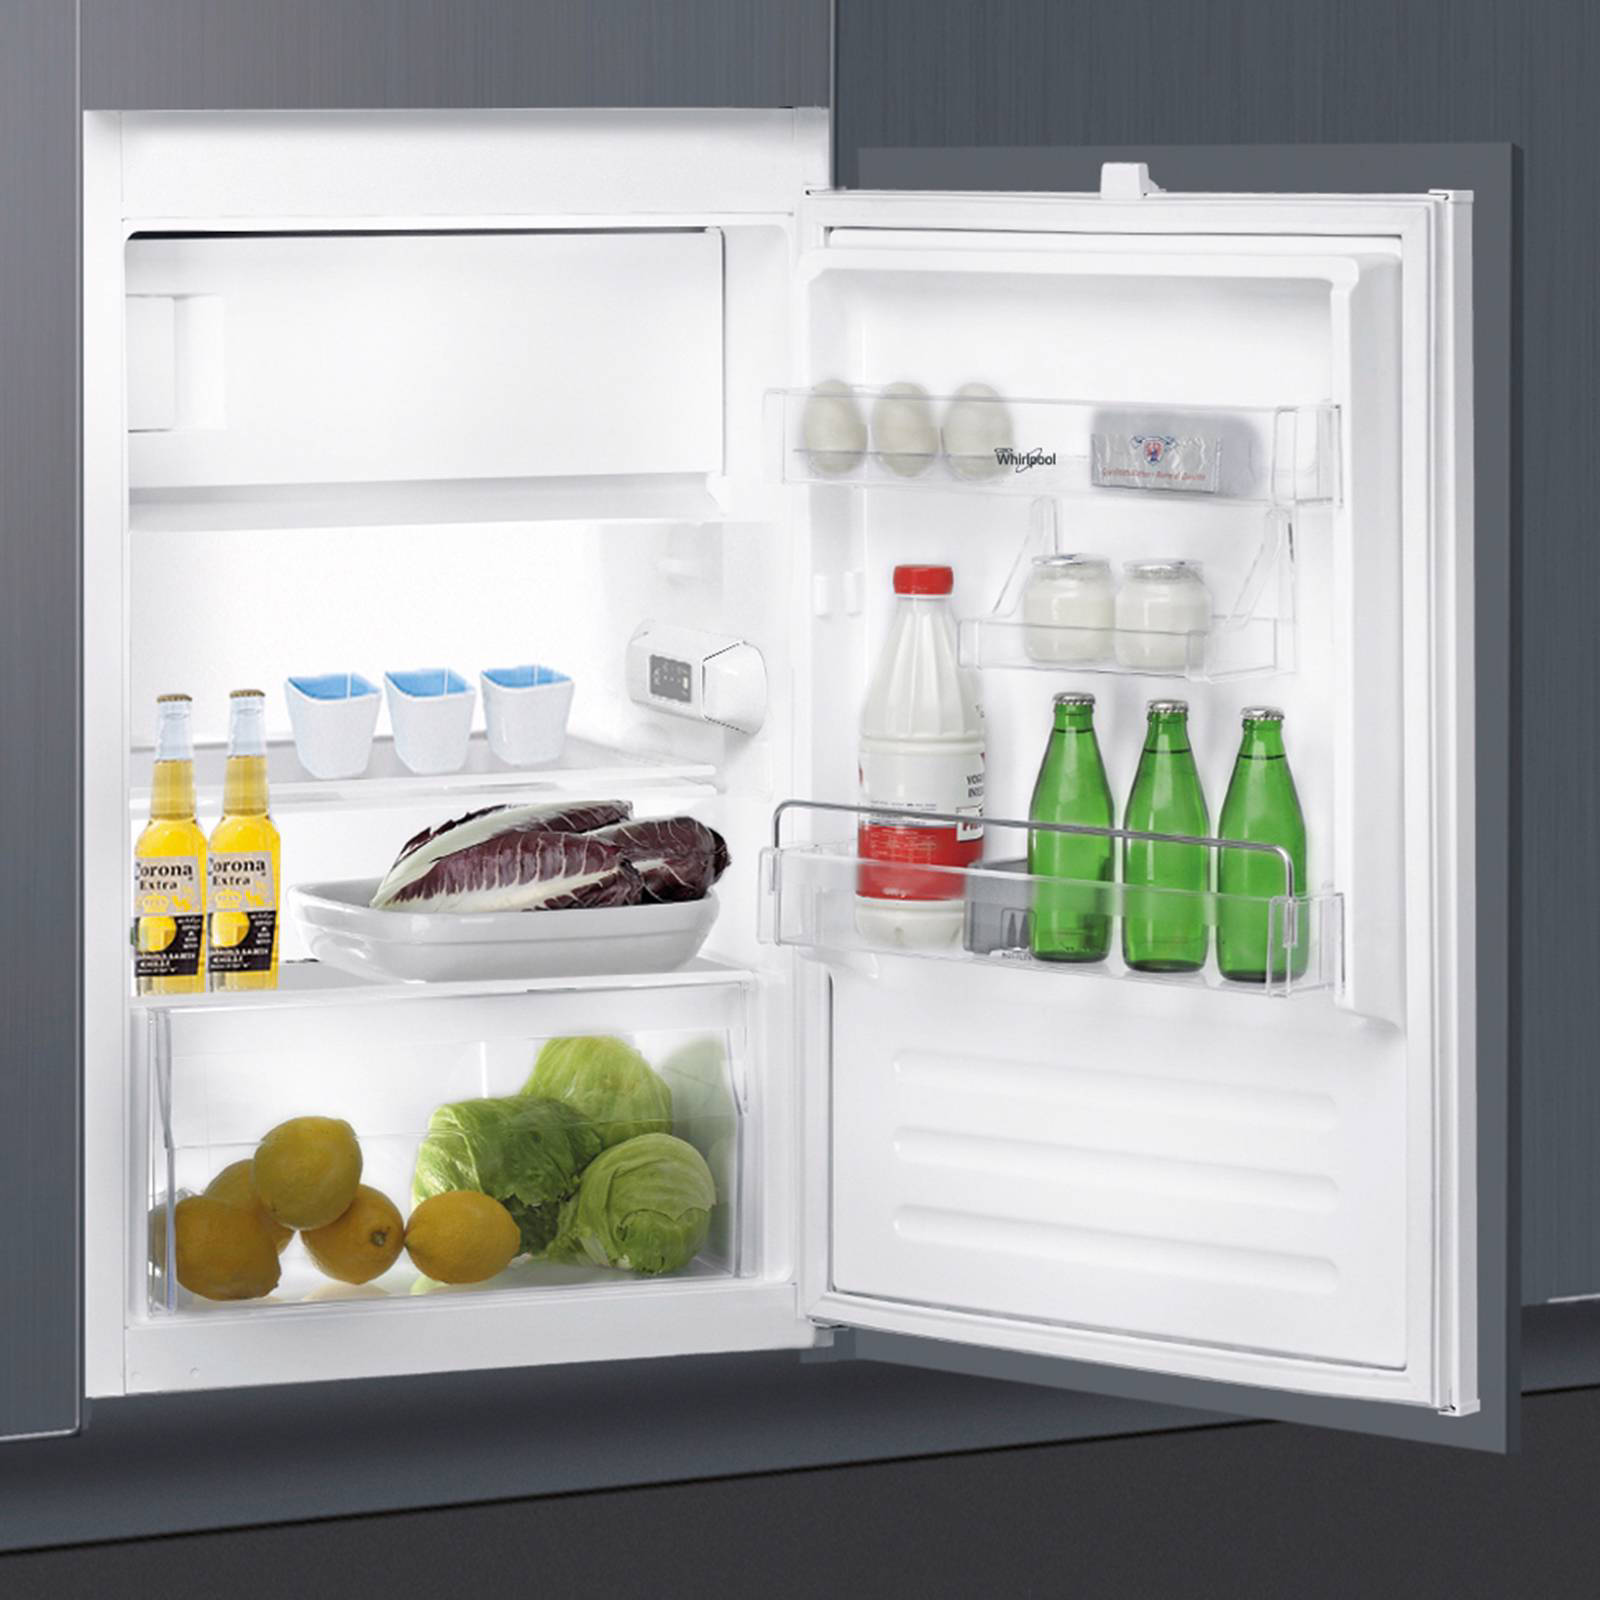 Whirlpool ARG 9472 A++ S inbouw koelkast